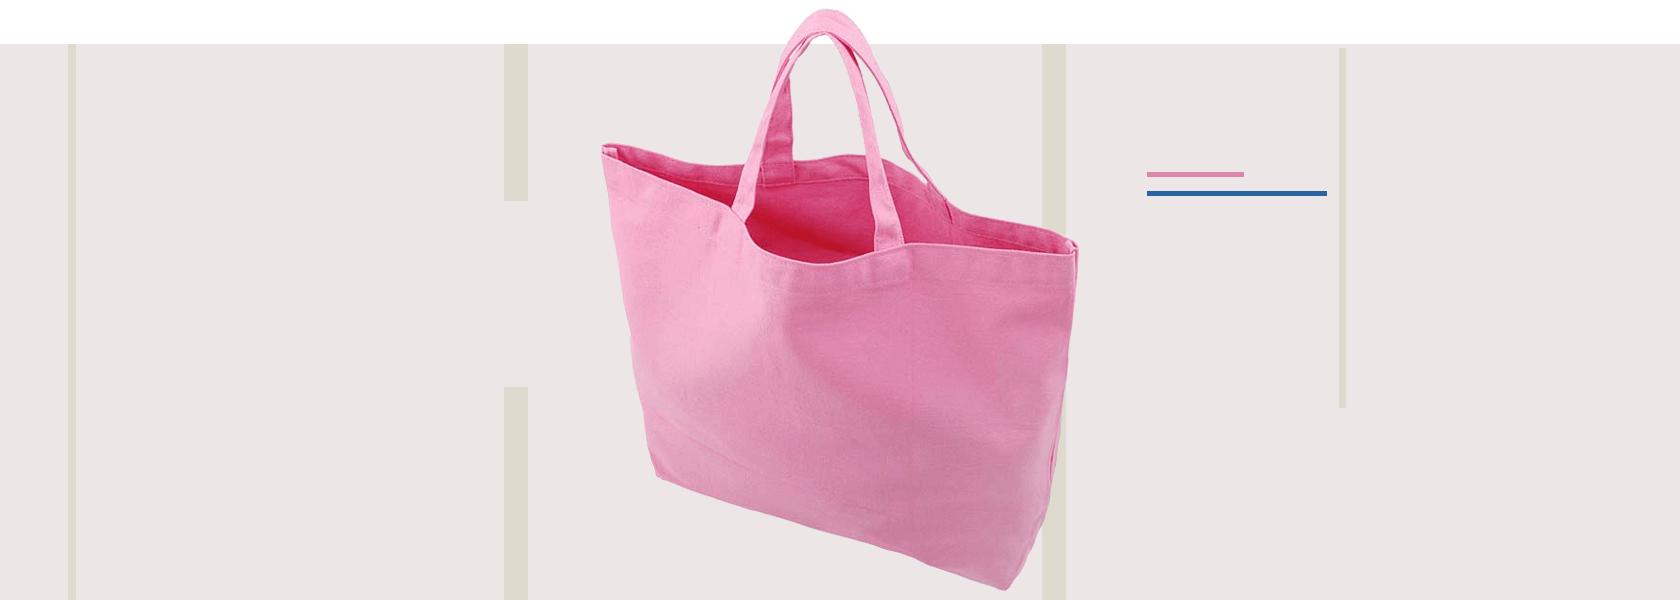 Cloth Bag Manufacturer - Cotton Bag